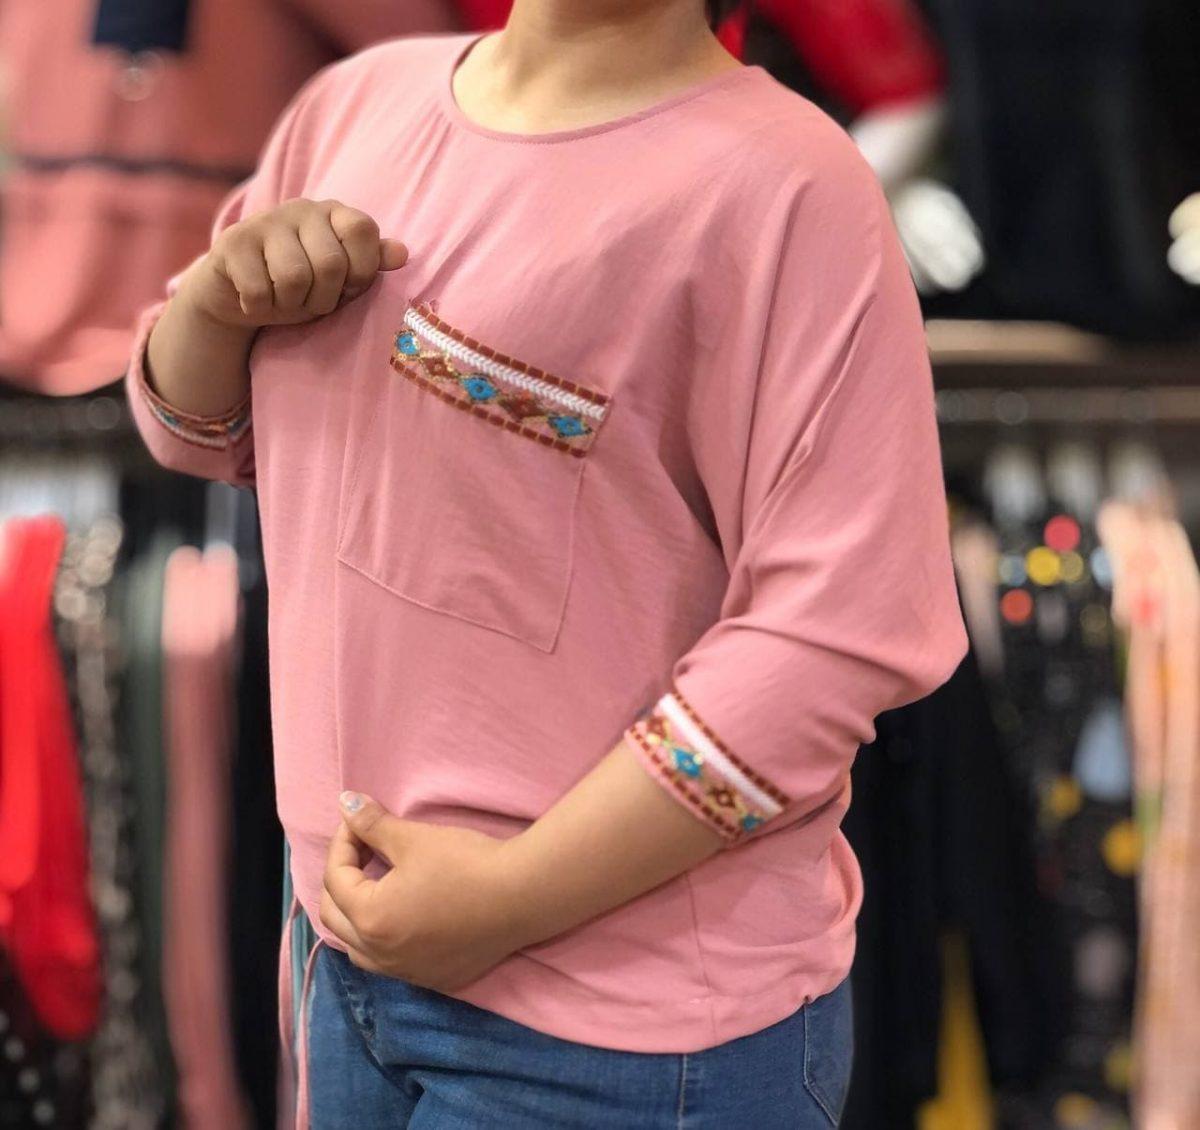 شومیز بلوز دخترانه خانگی